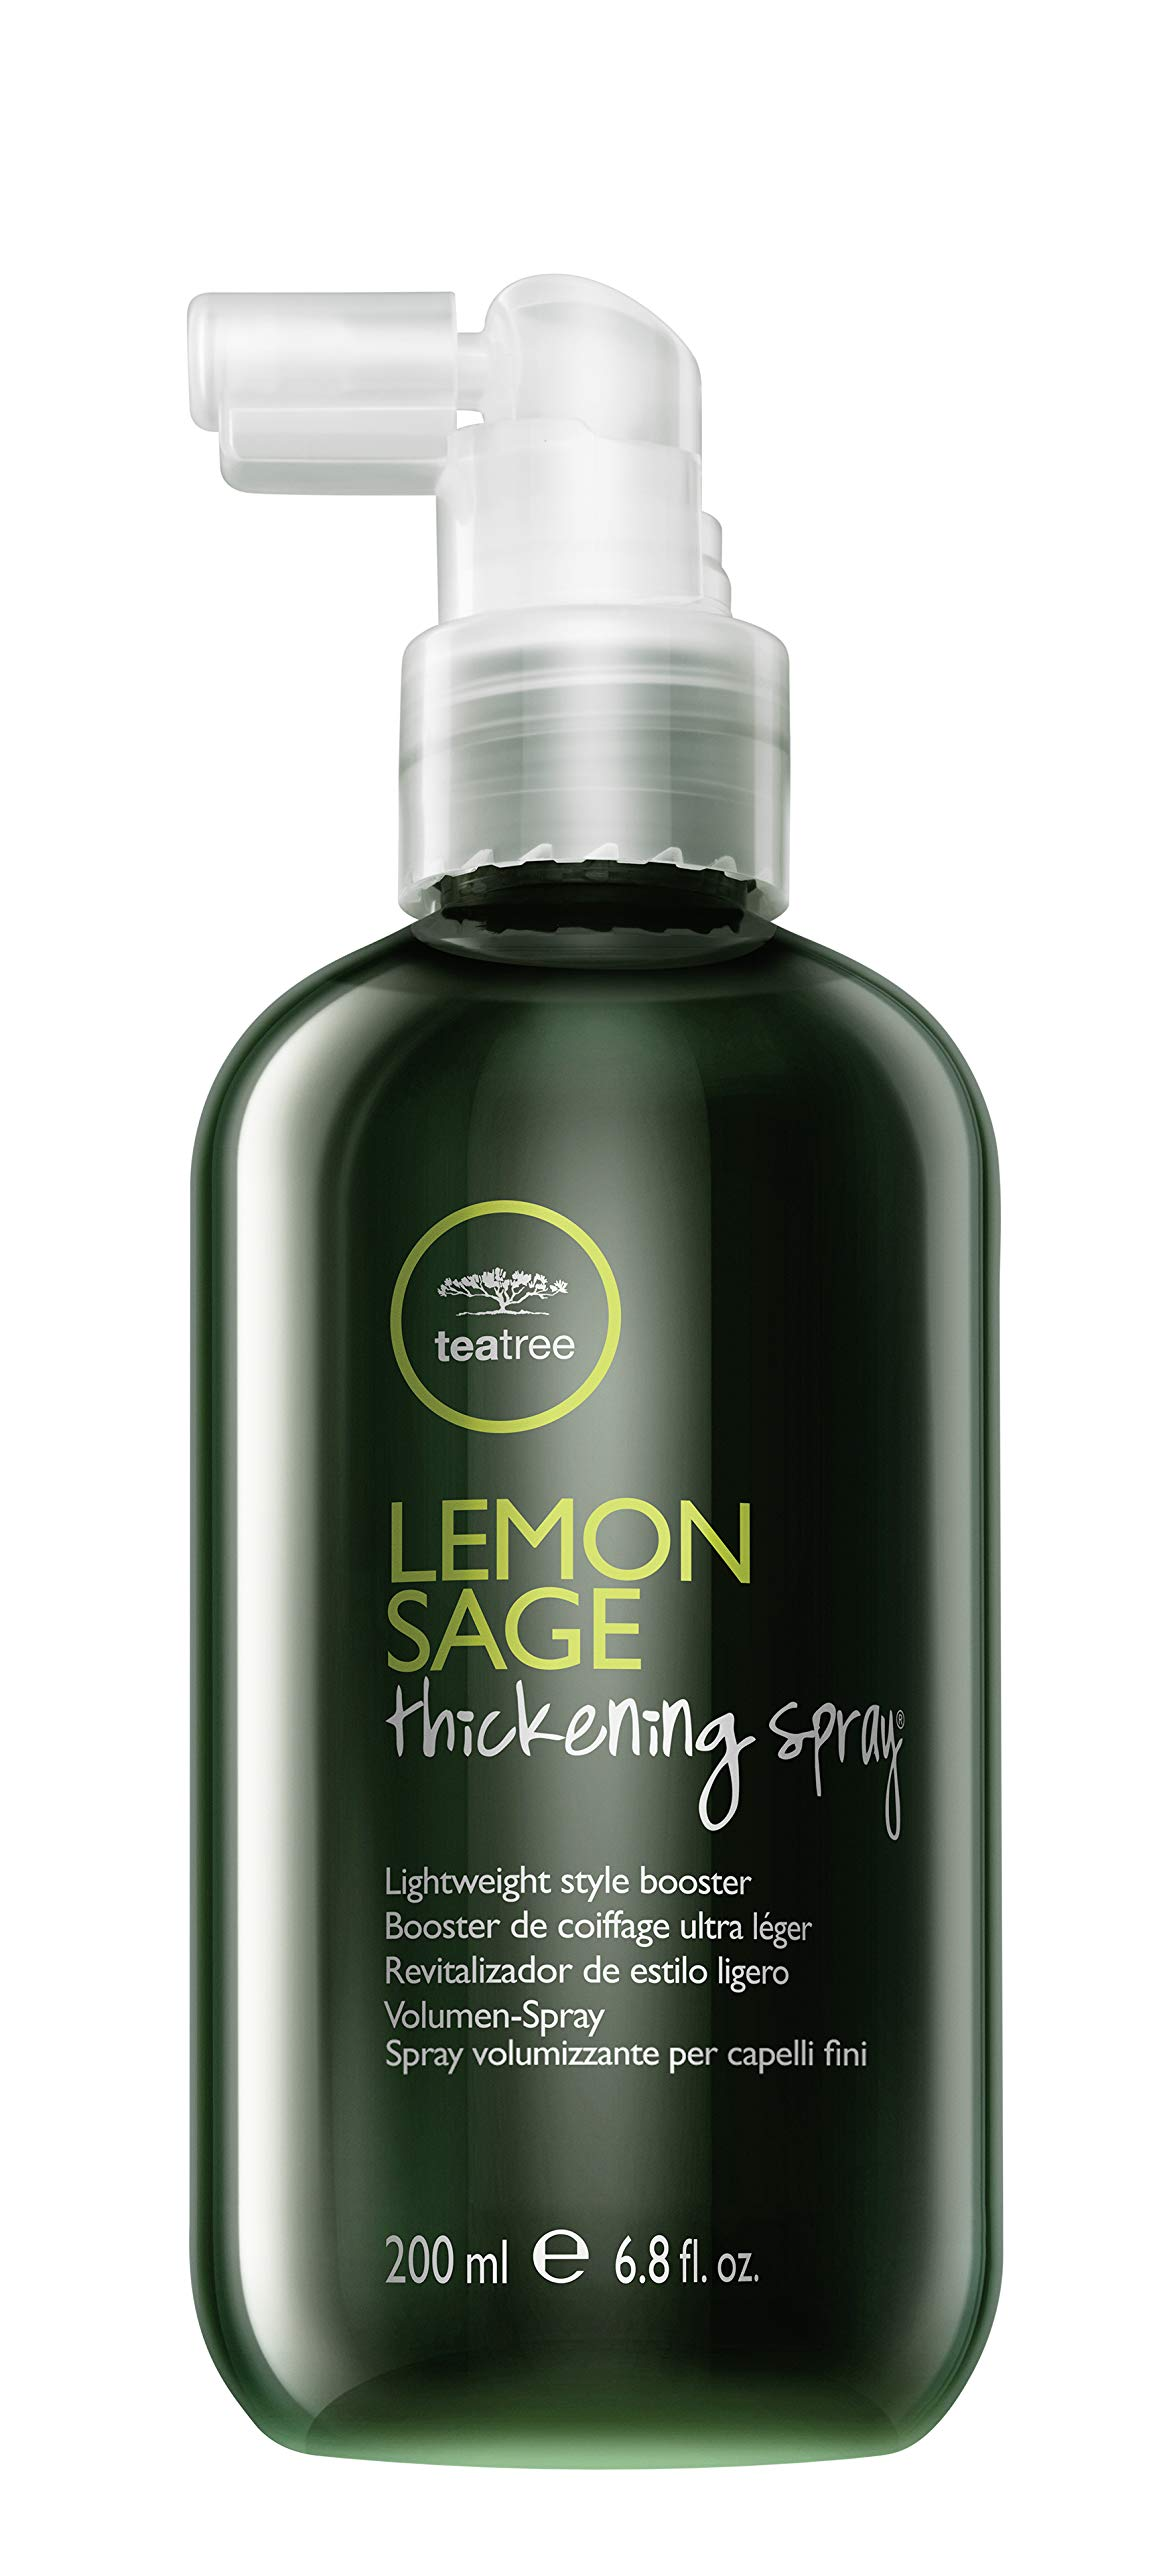 Tea Tree Lemon Sage Thickening Spray, 6.8 Fl Oz by Tea Tree